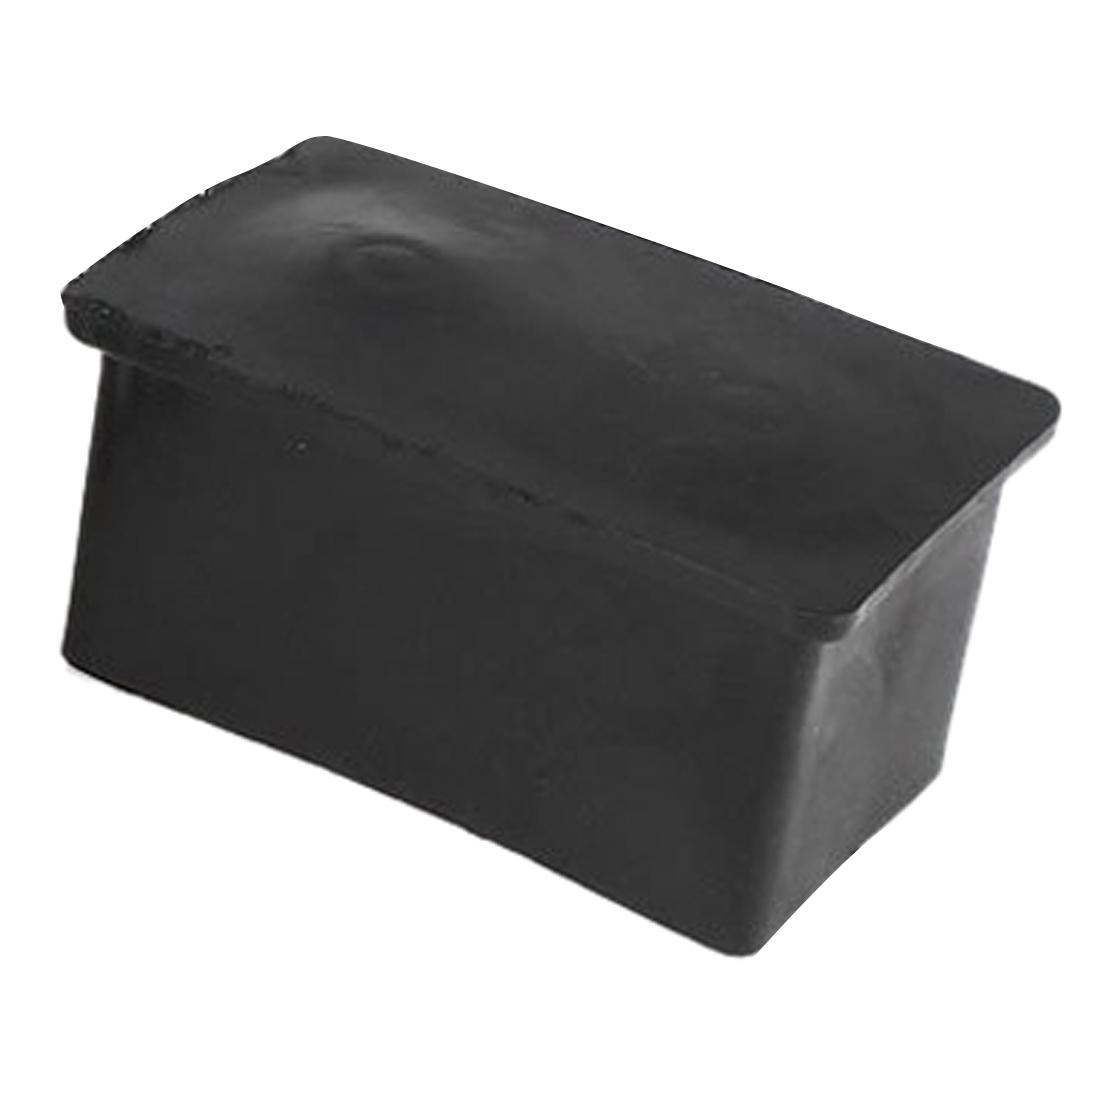 Rubber Chair Table Foot Cover Furniture Leg Protectors 25x50mm 10 Pcs Bt Ebay